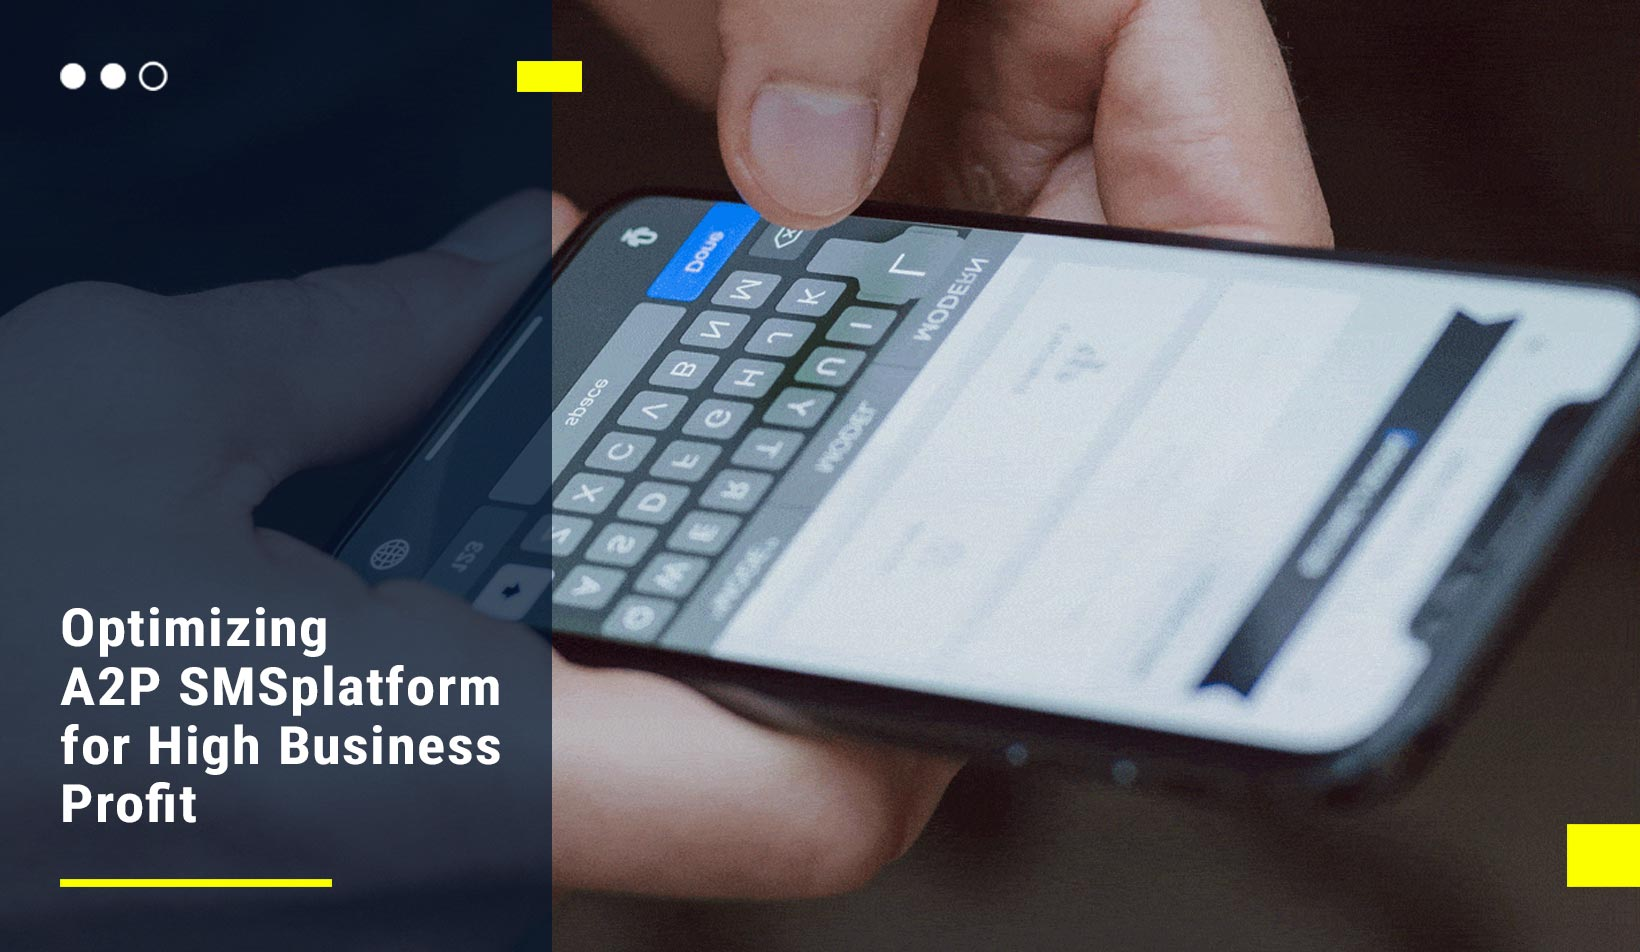 A2P SMS Platform